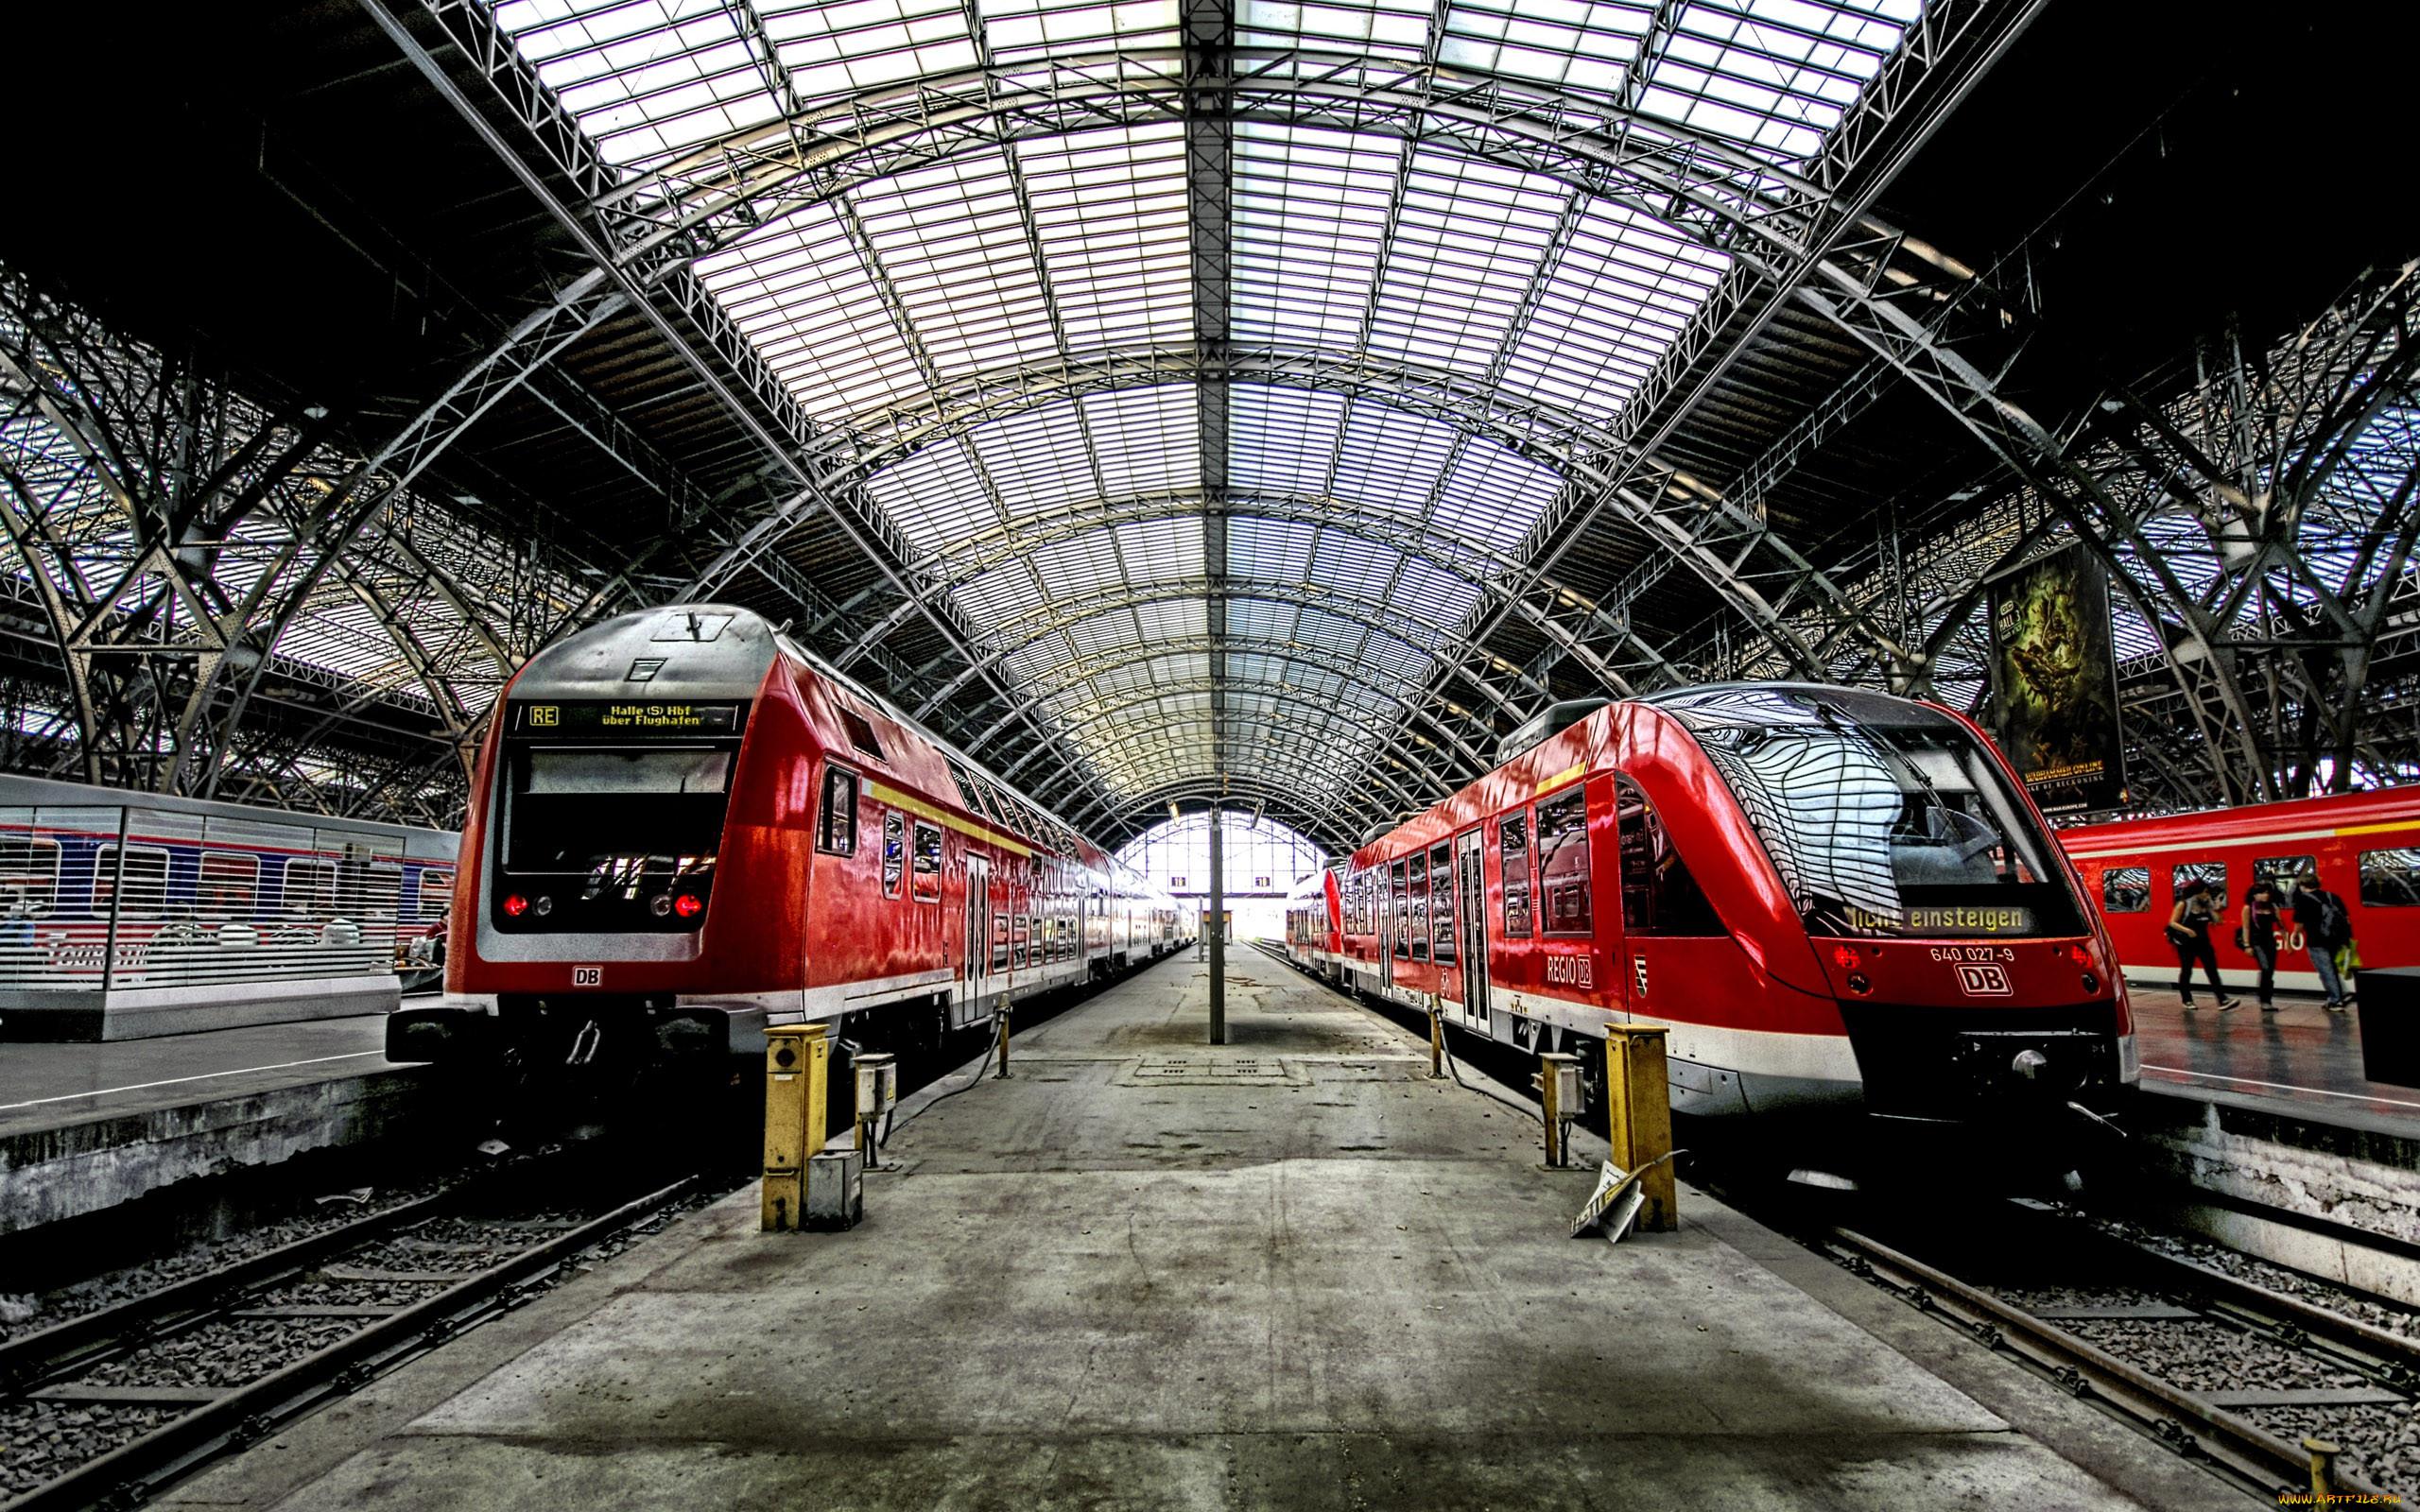 вокзал электричек картинки узелки могут